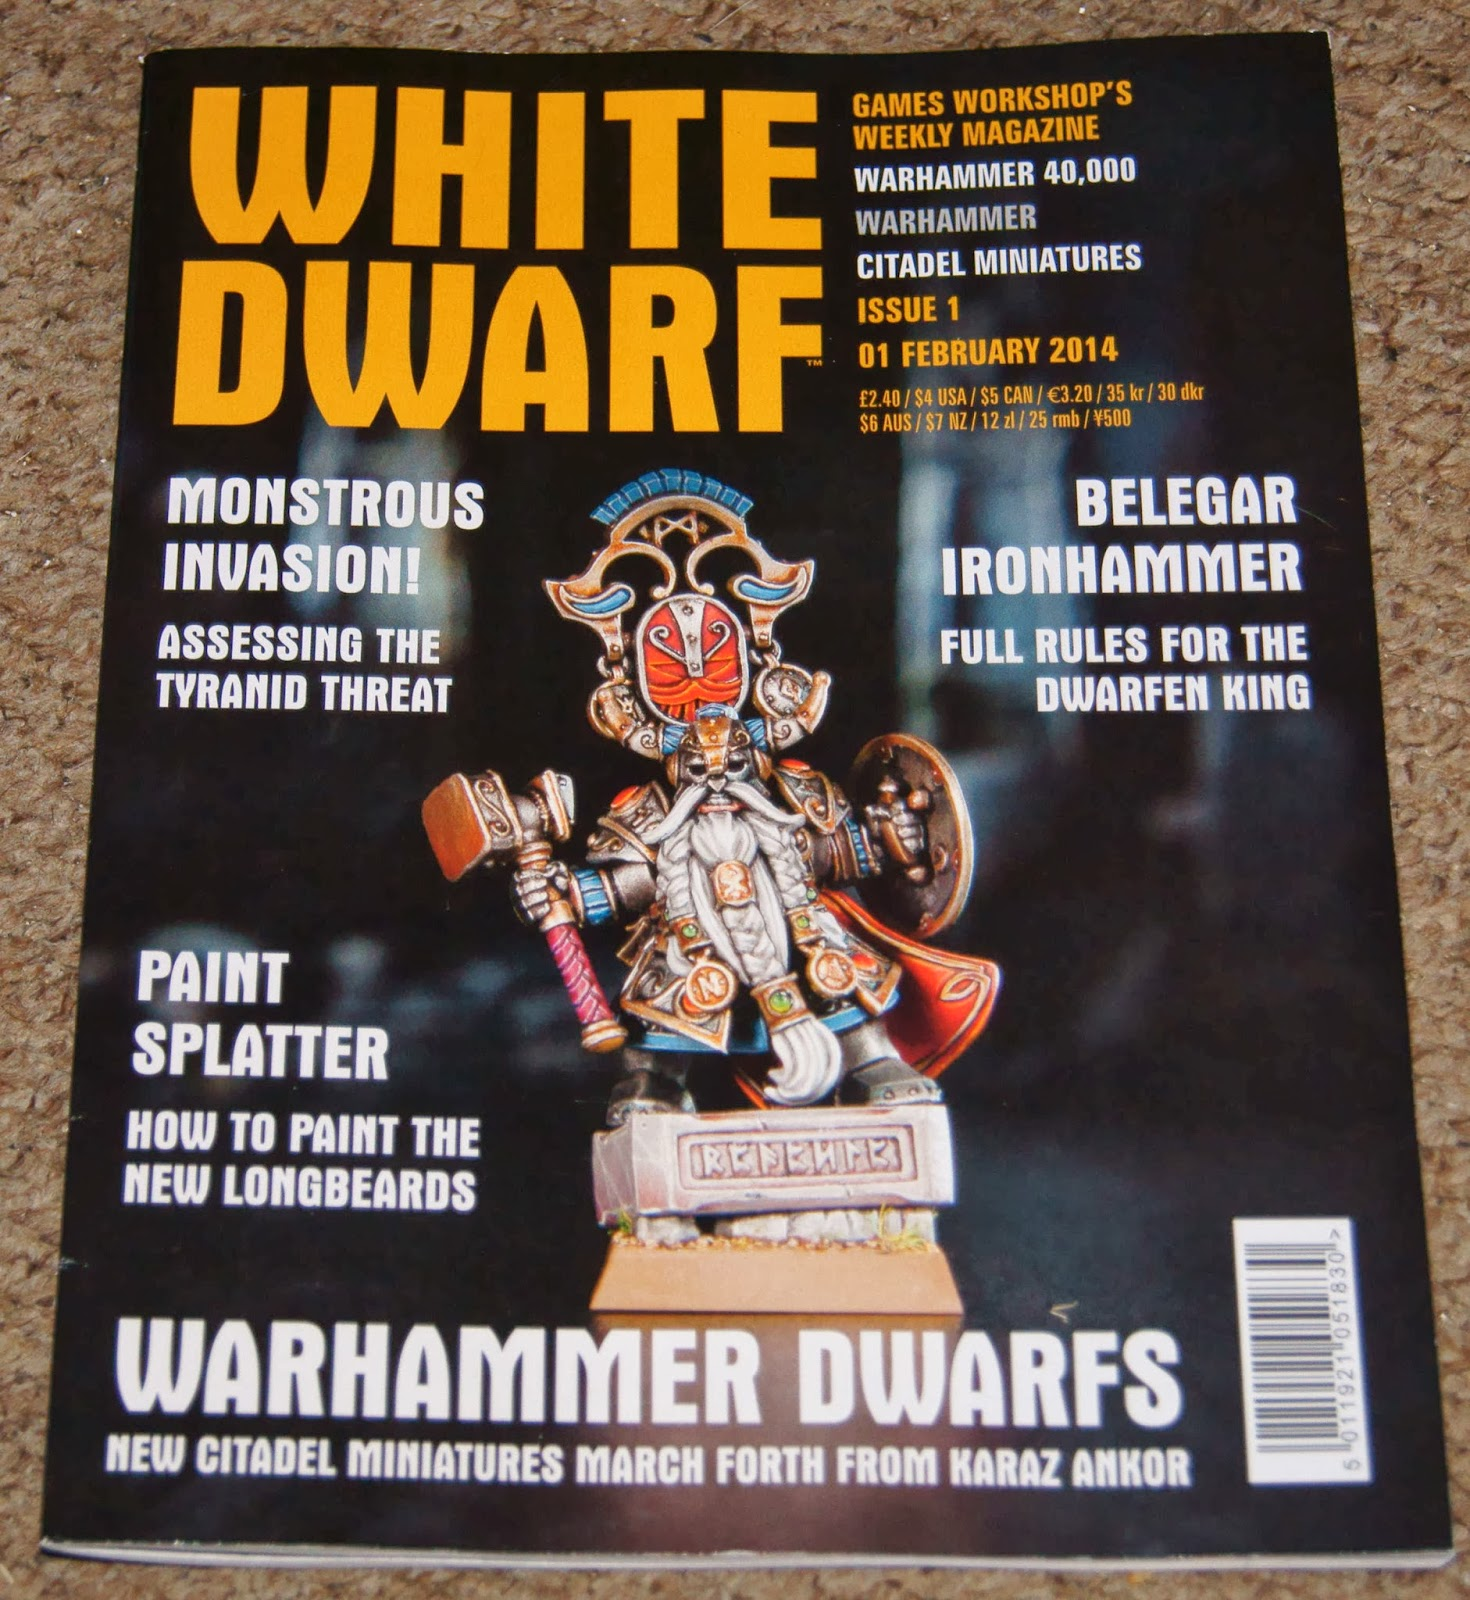 Painting White Dwarf Magazine Articles (page 3) - Pics ...